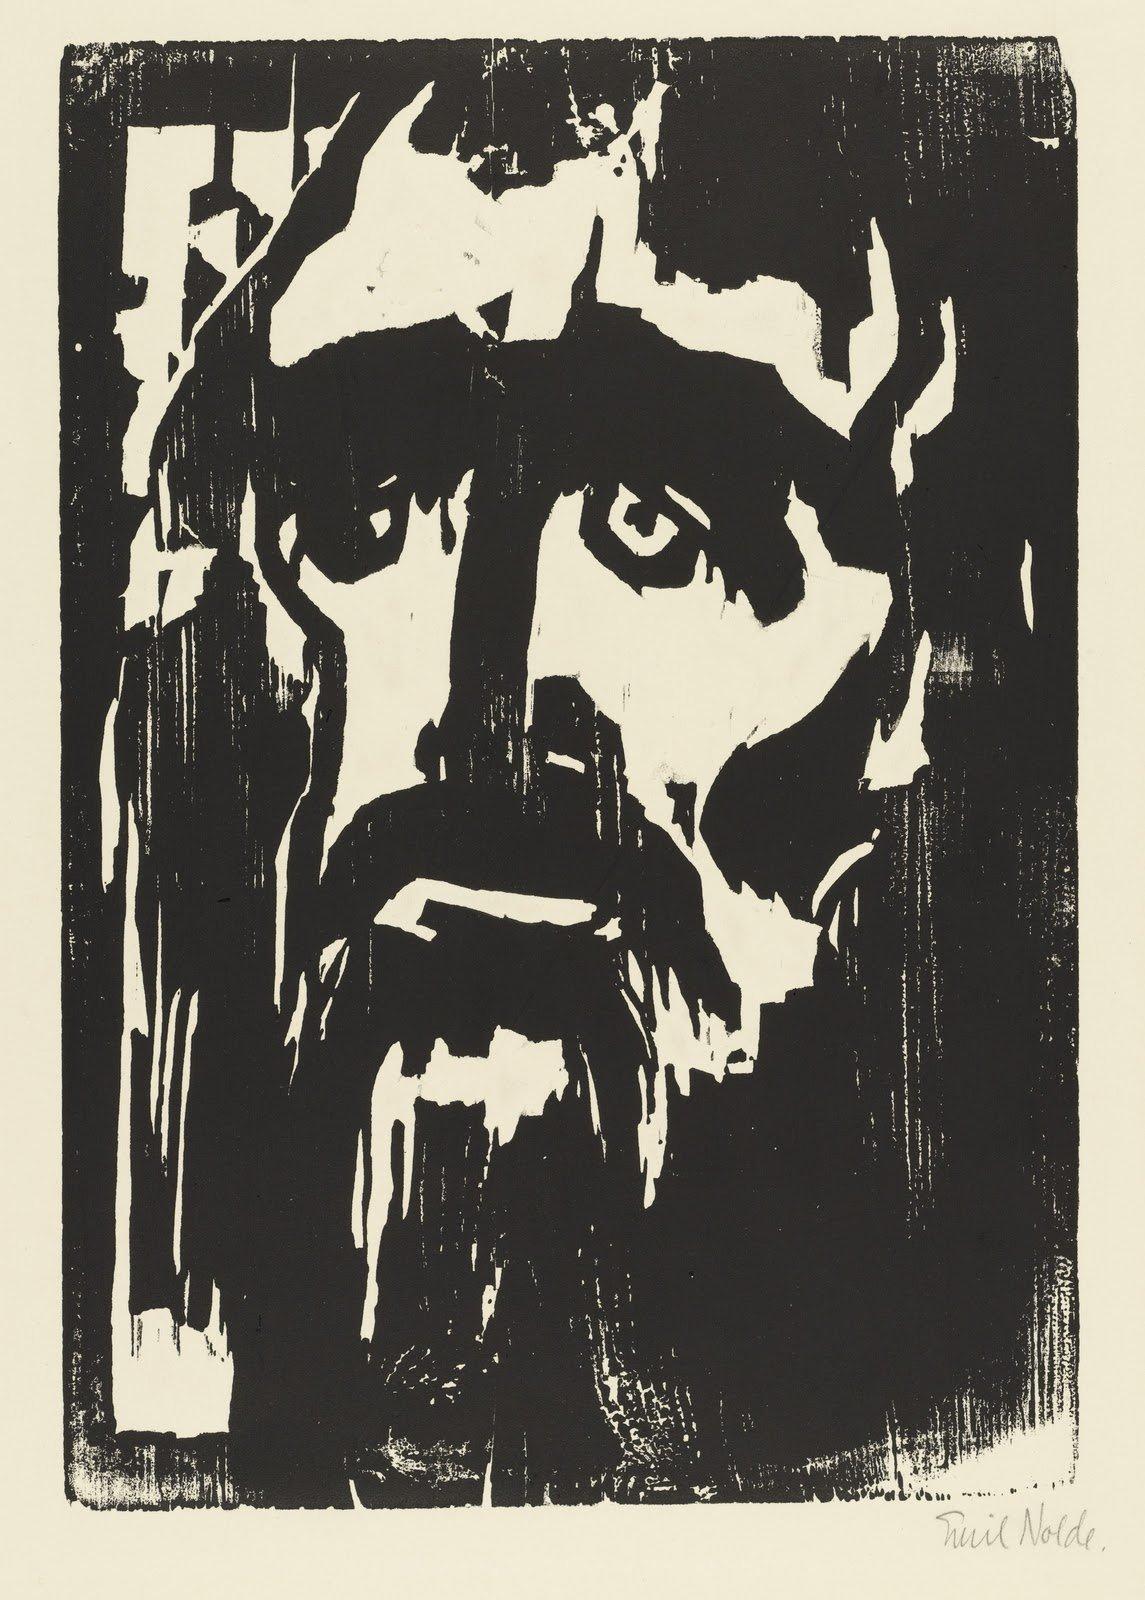 Emil_Nolde_Prophet_Woodcut_1912.jpg